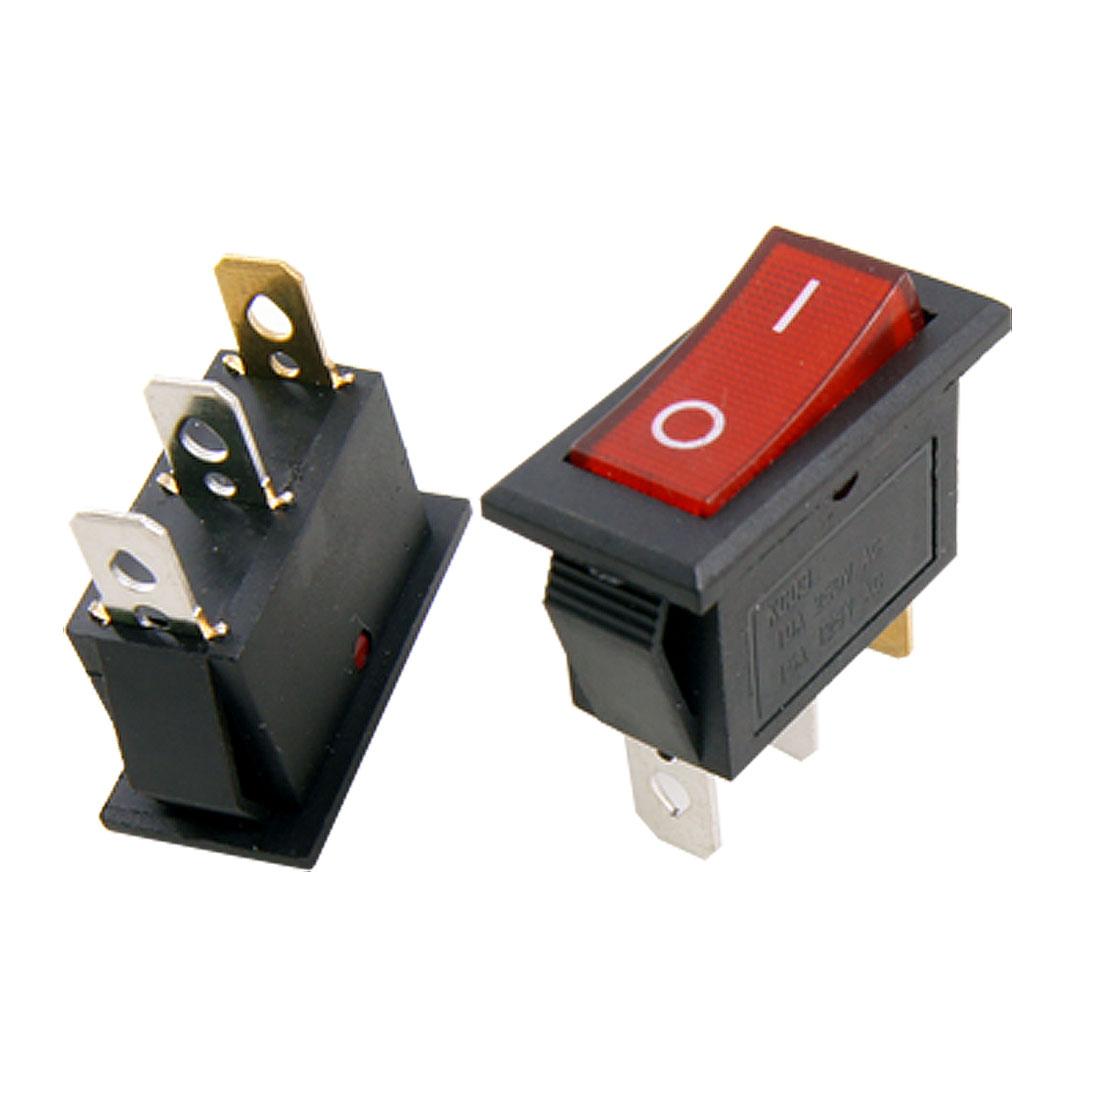 5 Pcs Red Light Lamp On-Off 2 Position SPST Boat Rocker Switch 3 Solder Lug Terminals